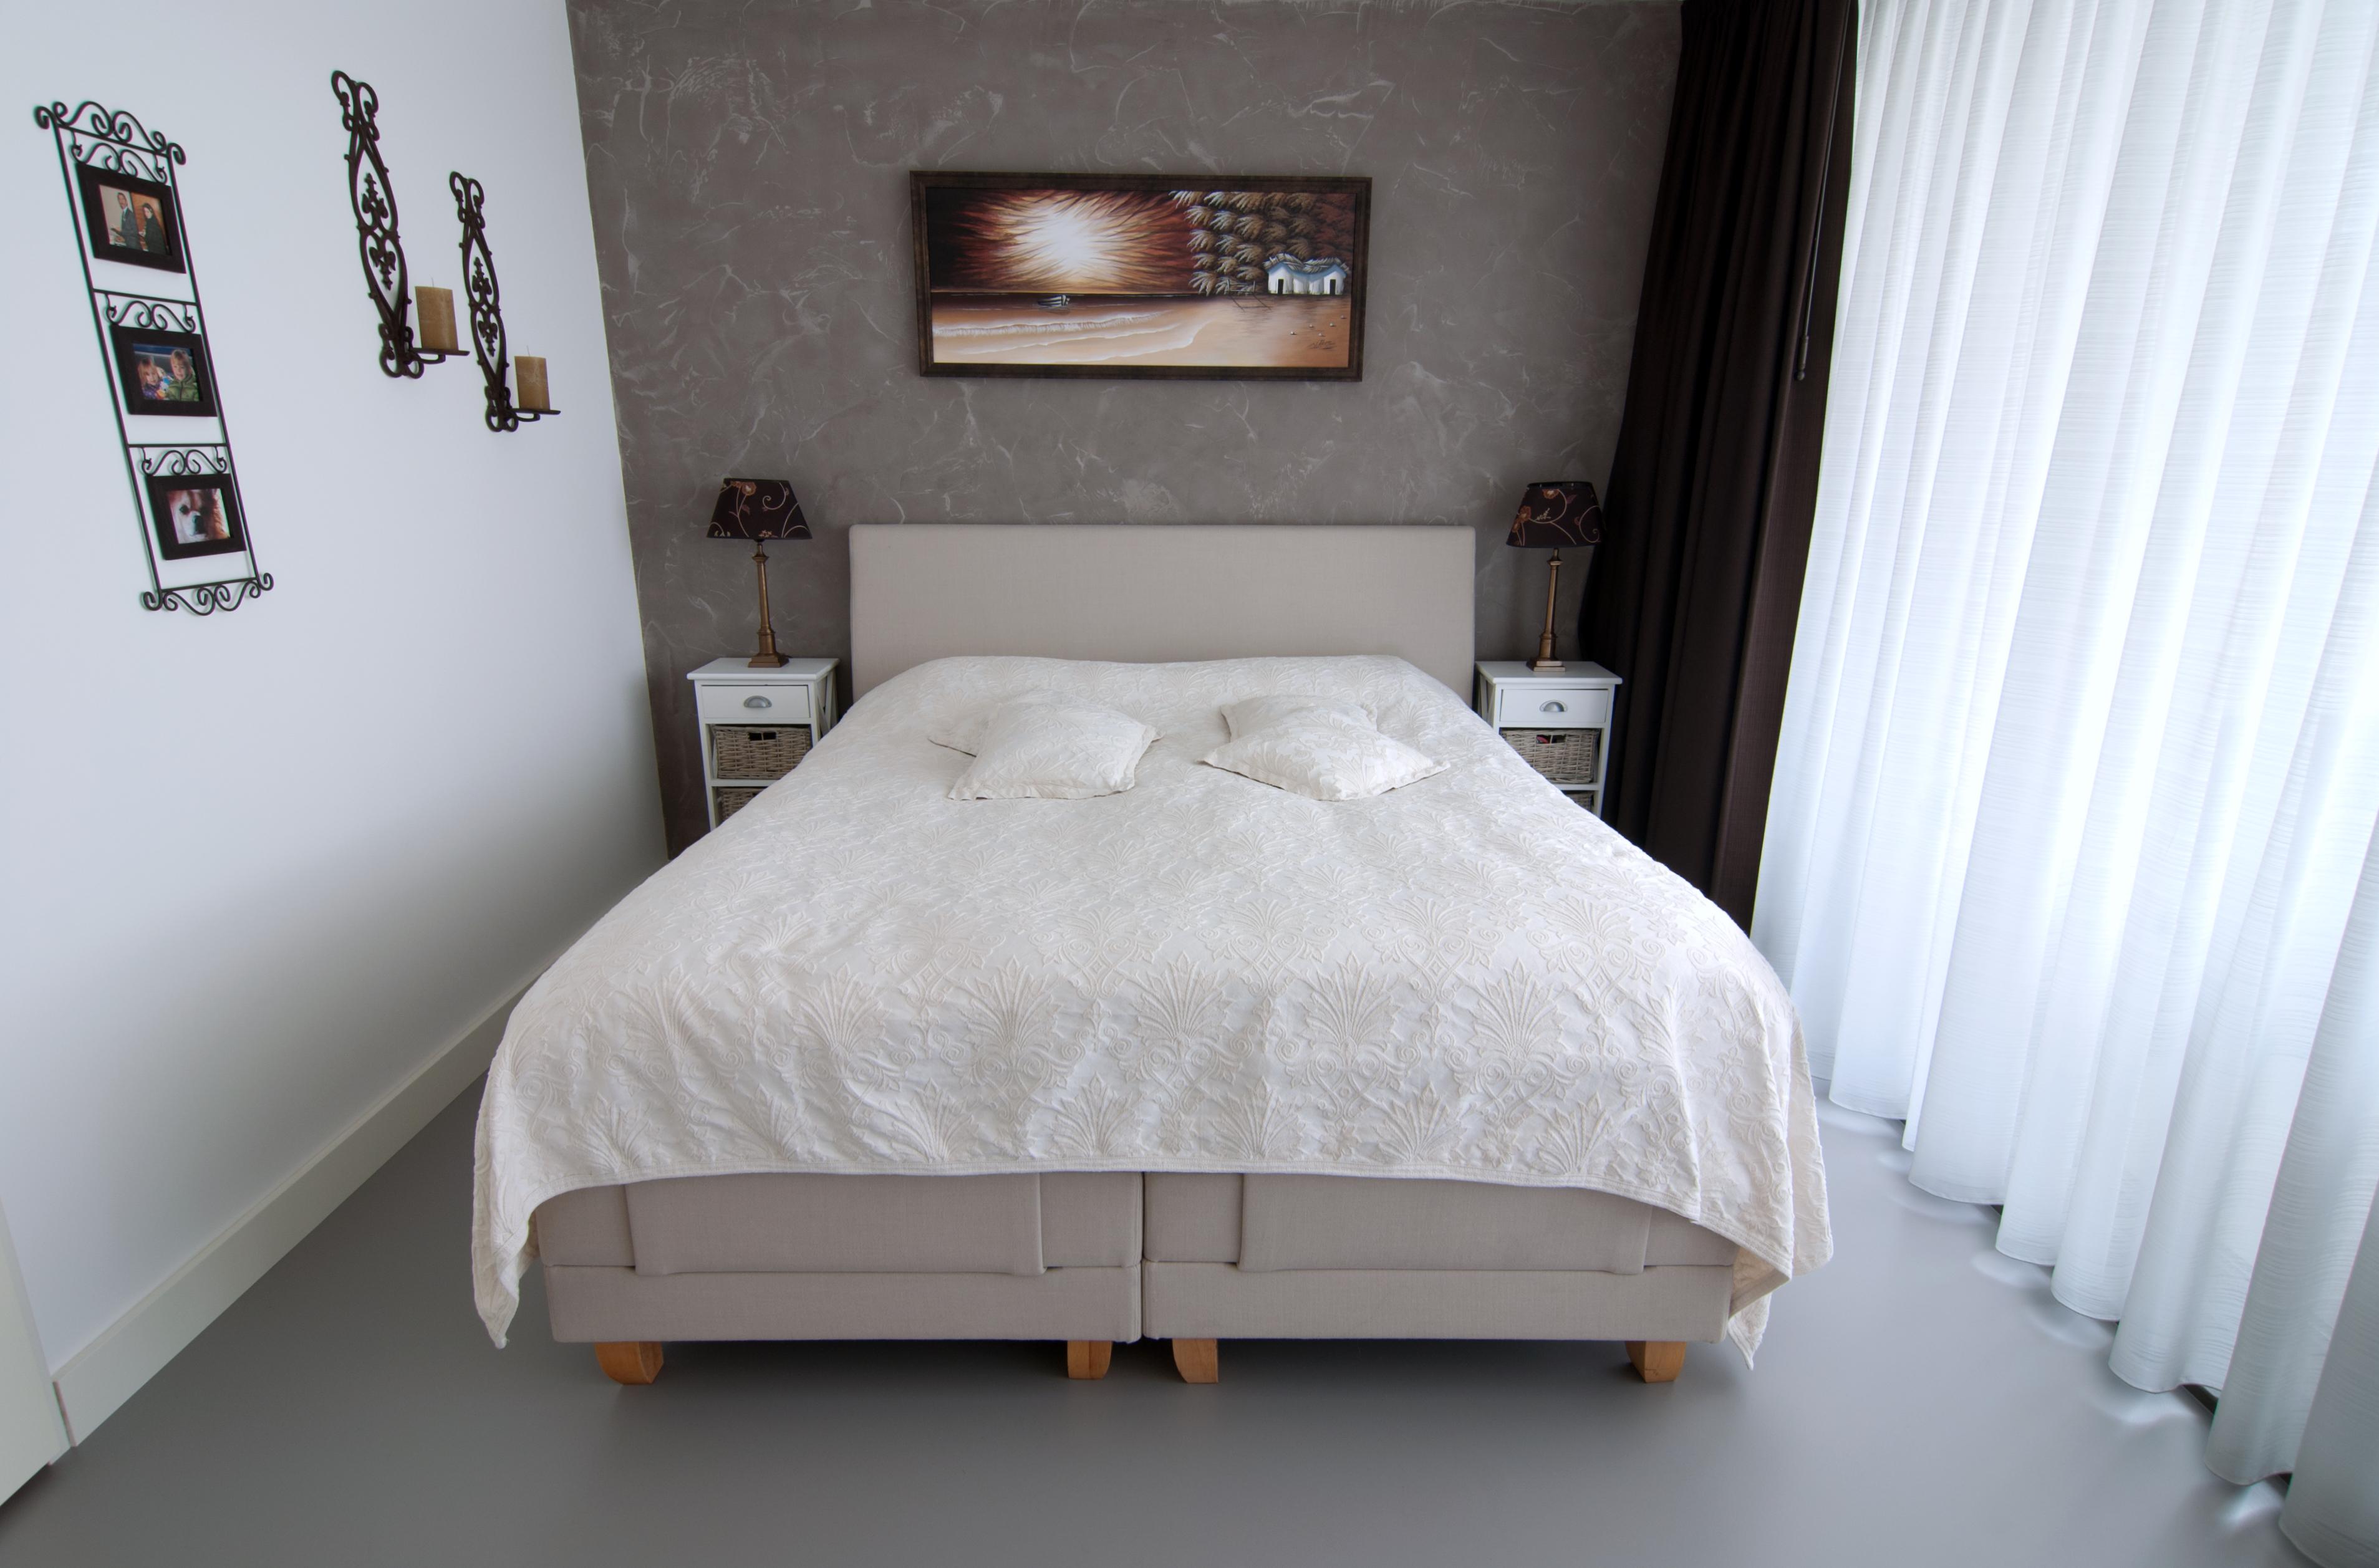 Slaapkamer vloer + wand - Cemcolori